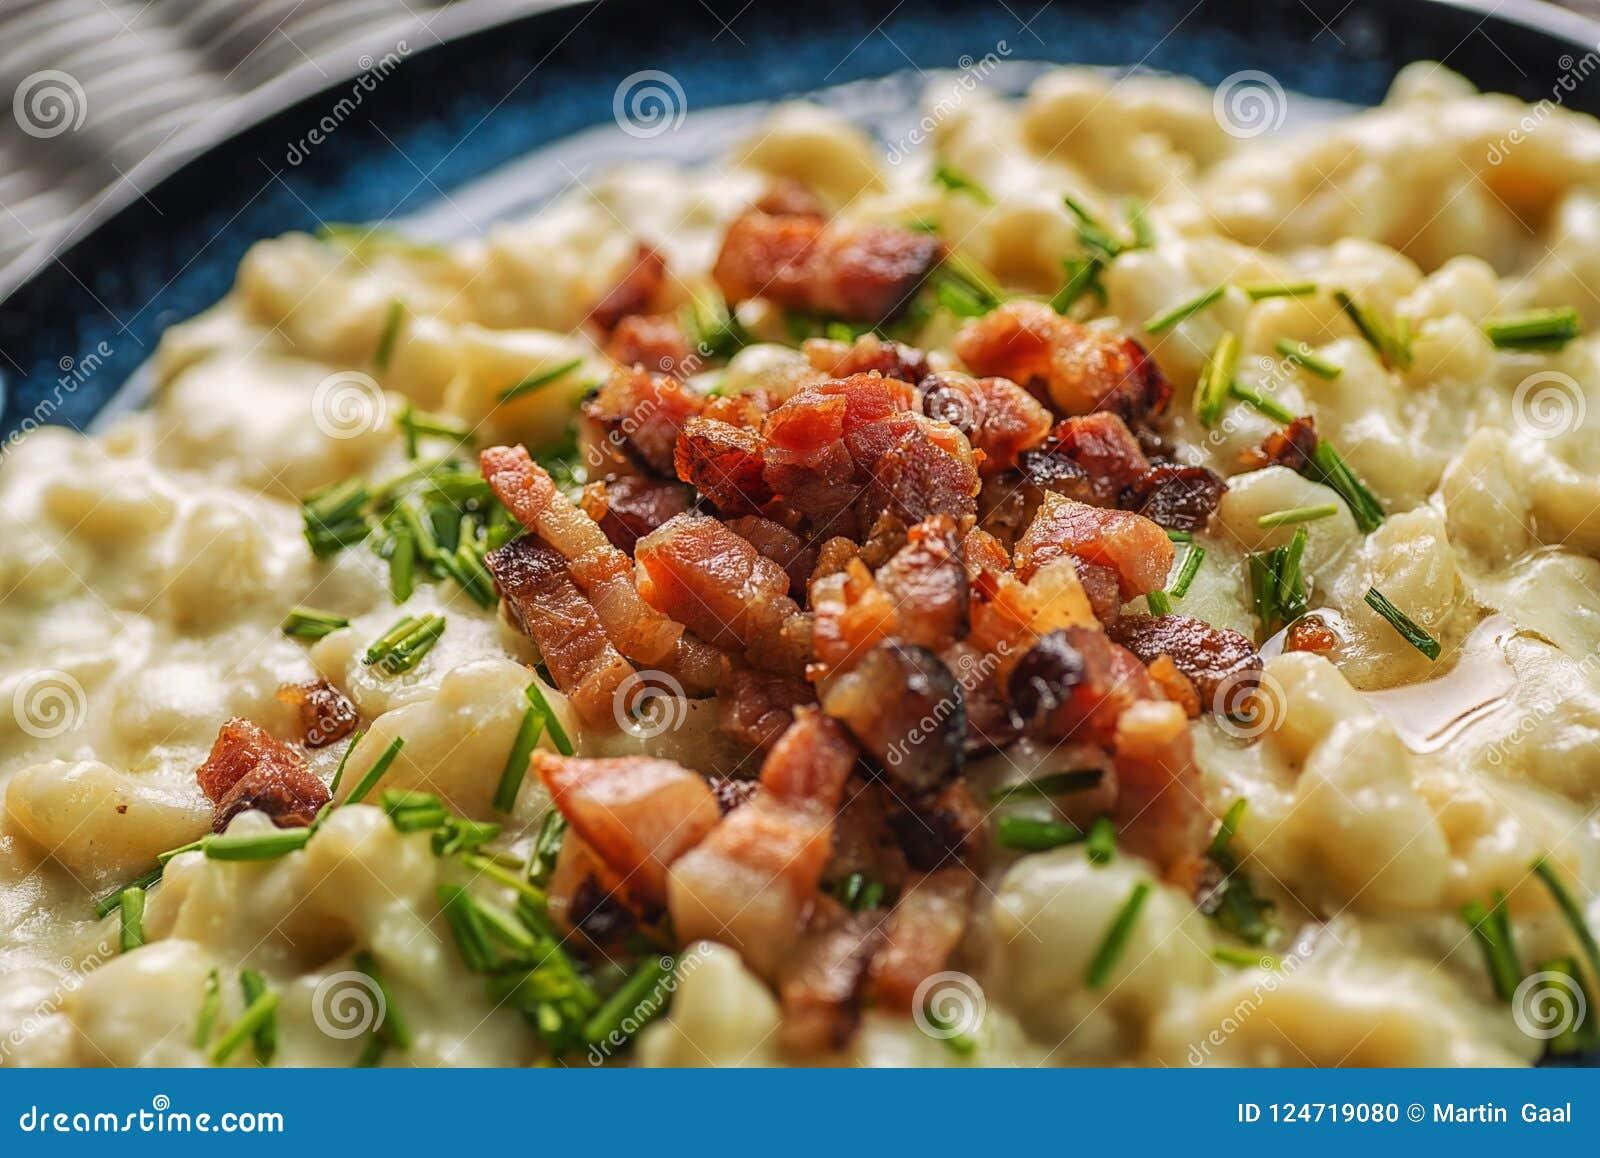 Potato dumplings with sheep cheese and bacon, traditional slovakian food, slovak gastronomy